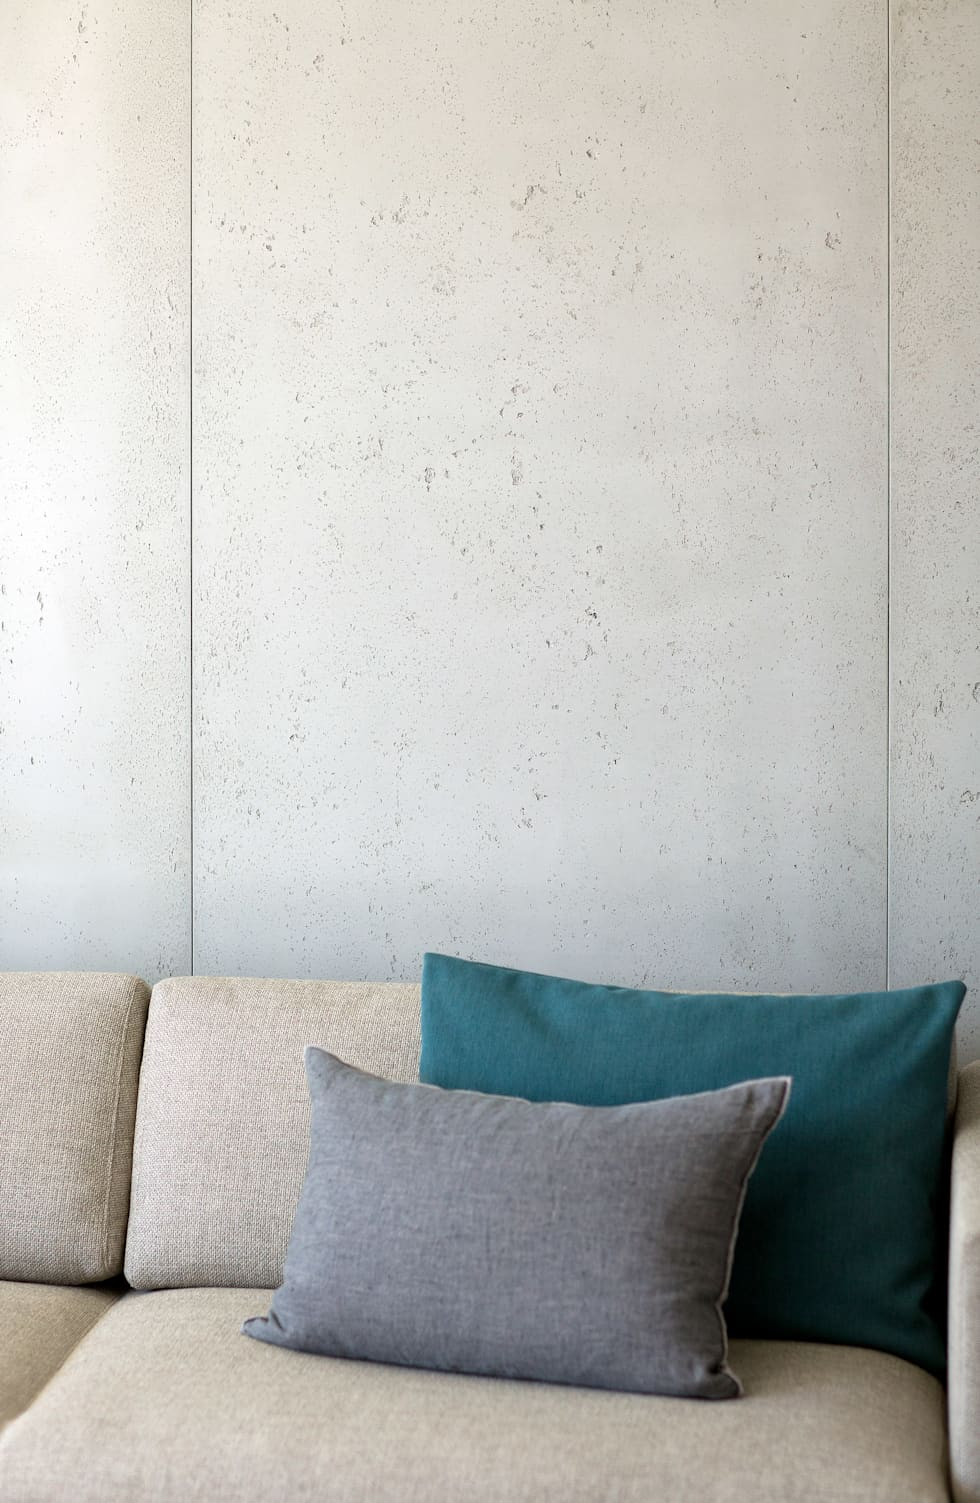 Studio California: Salon de style de style Moderne par Concrete LCDA